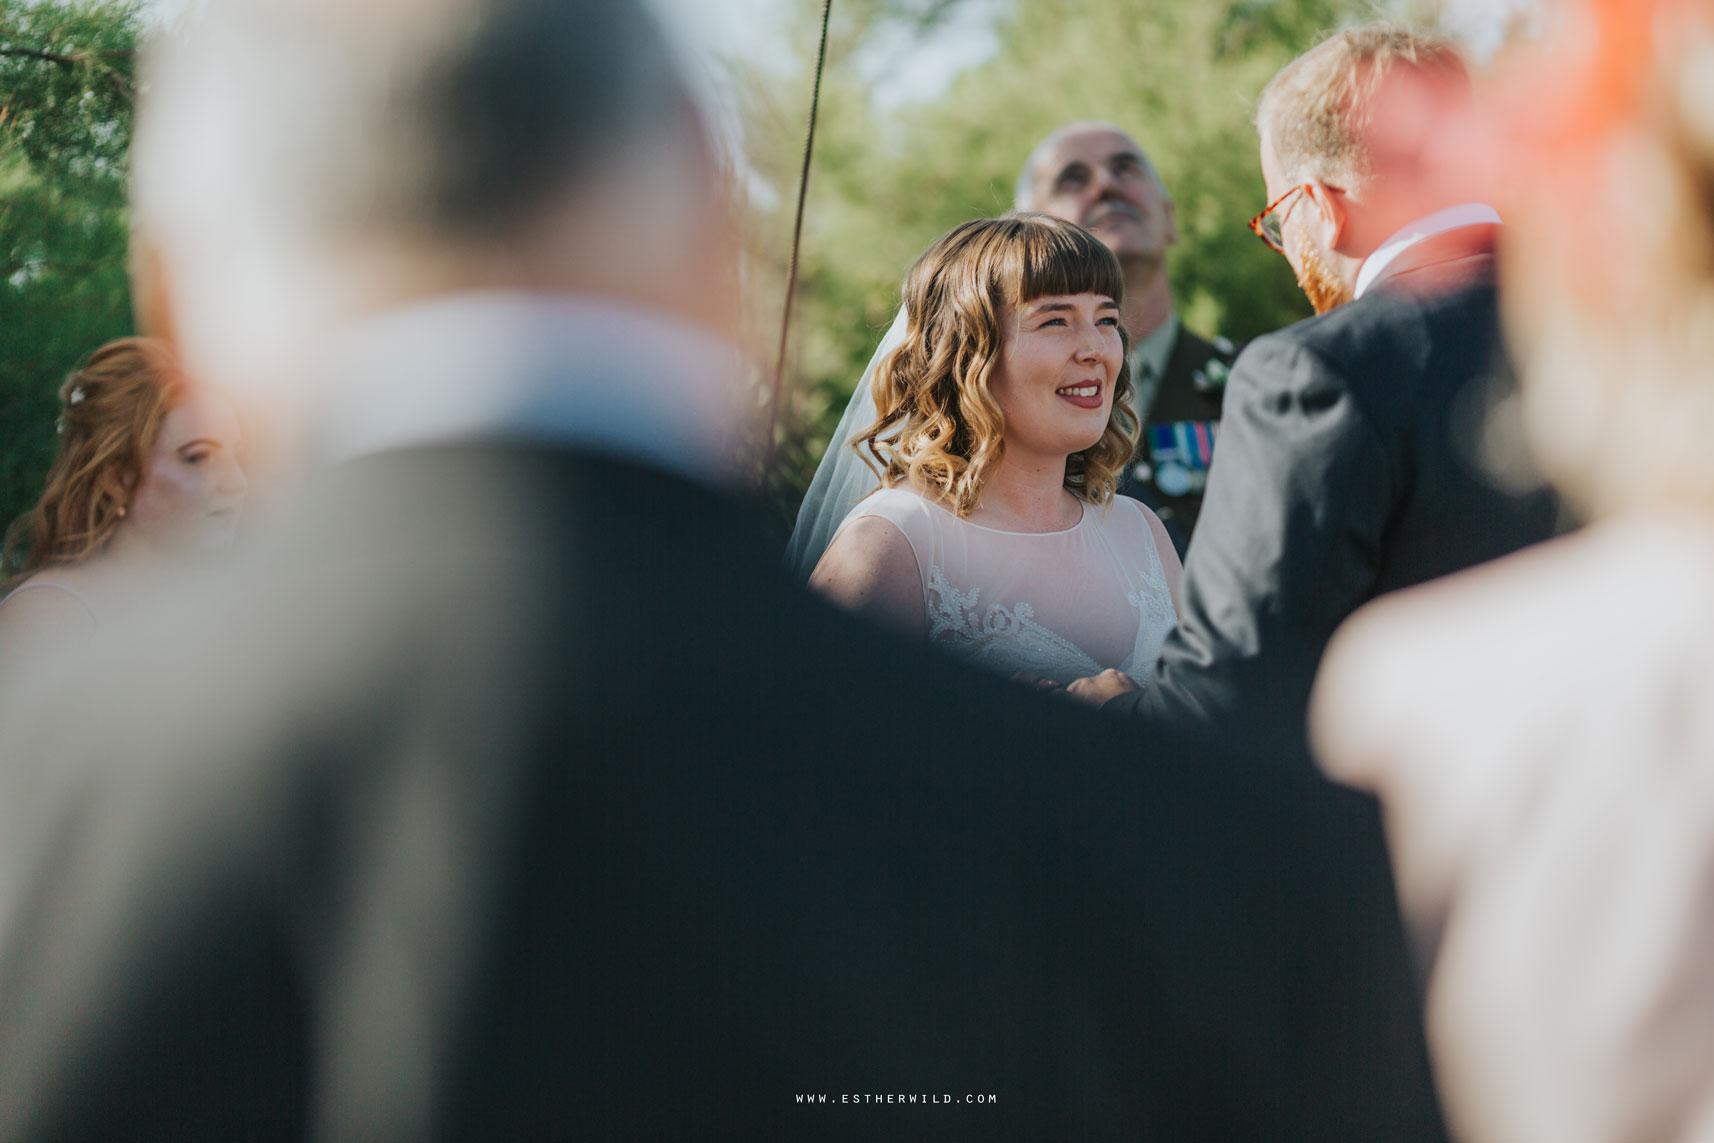 Cromer_Wedding_Beach_Outdoor_Ceremony_Norfolk_North_Lodge_Registry_Office_Rocket_House_Cafe_Cromer_Pier_IMG_3837_IMGL8002.jpg